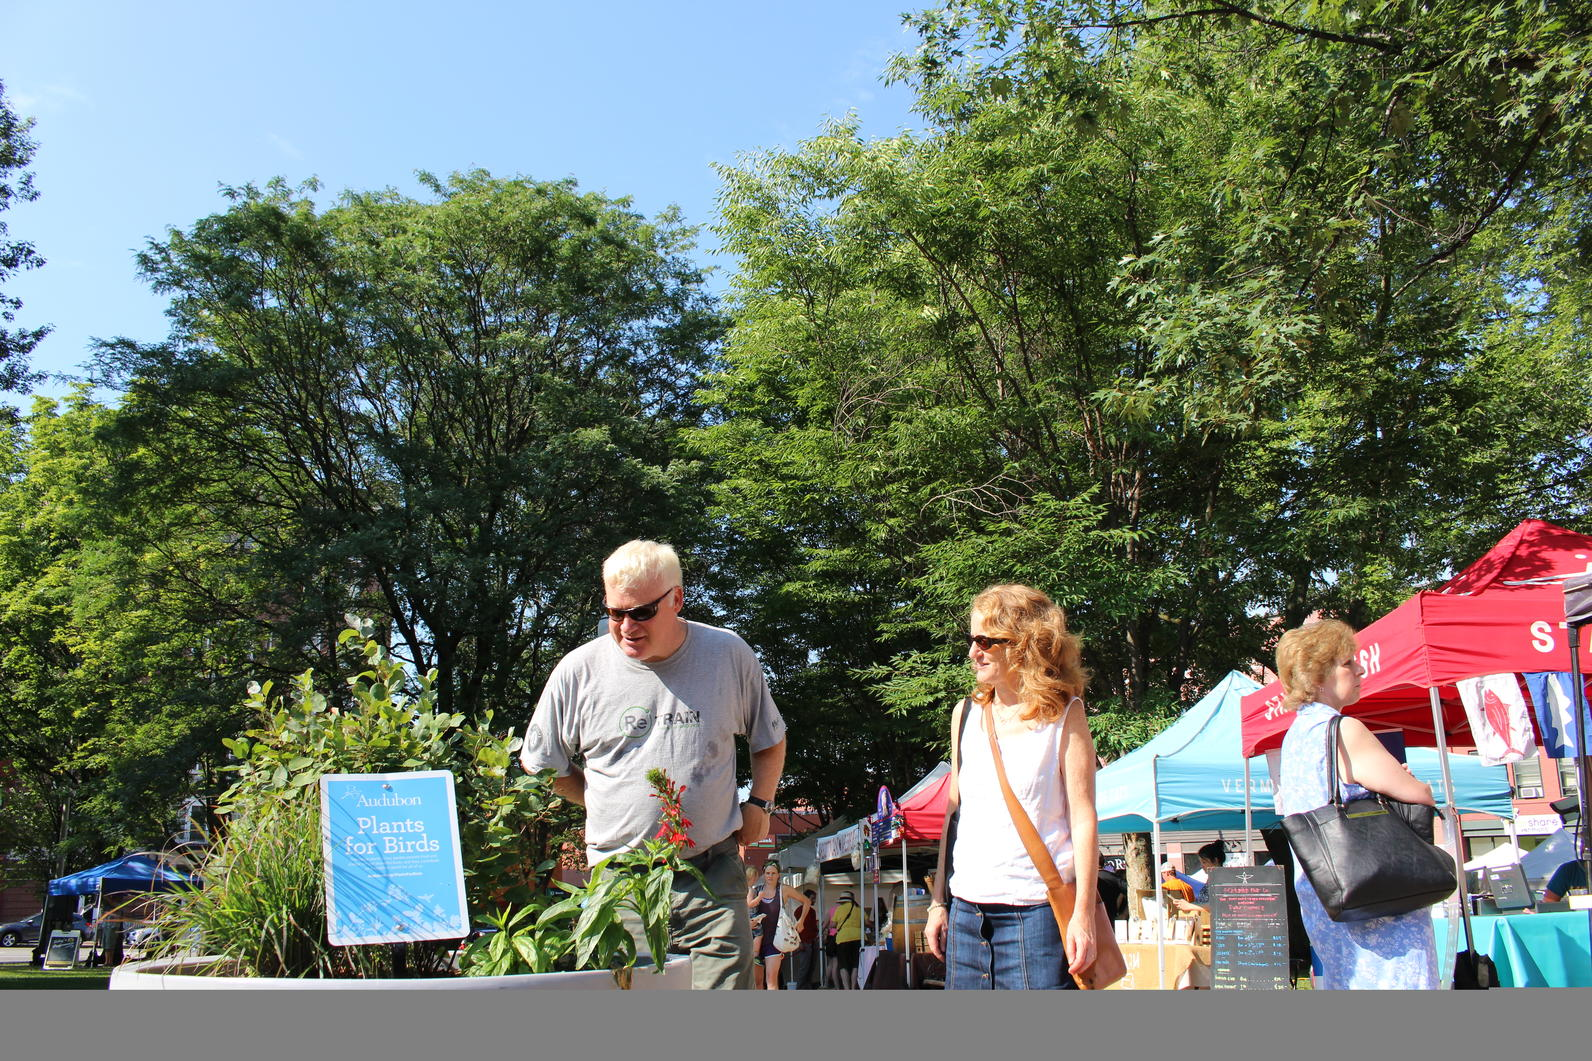 Plants for Birds Urban Planters